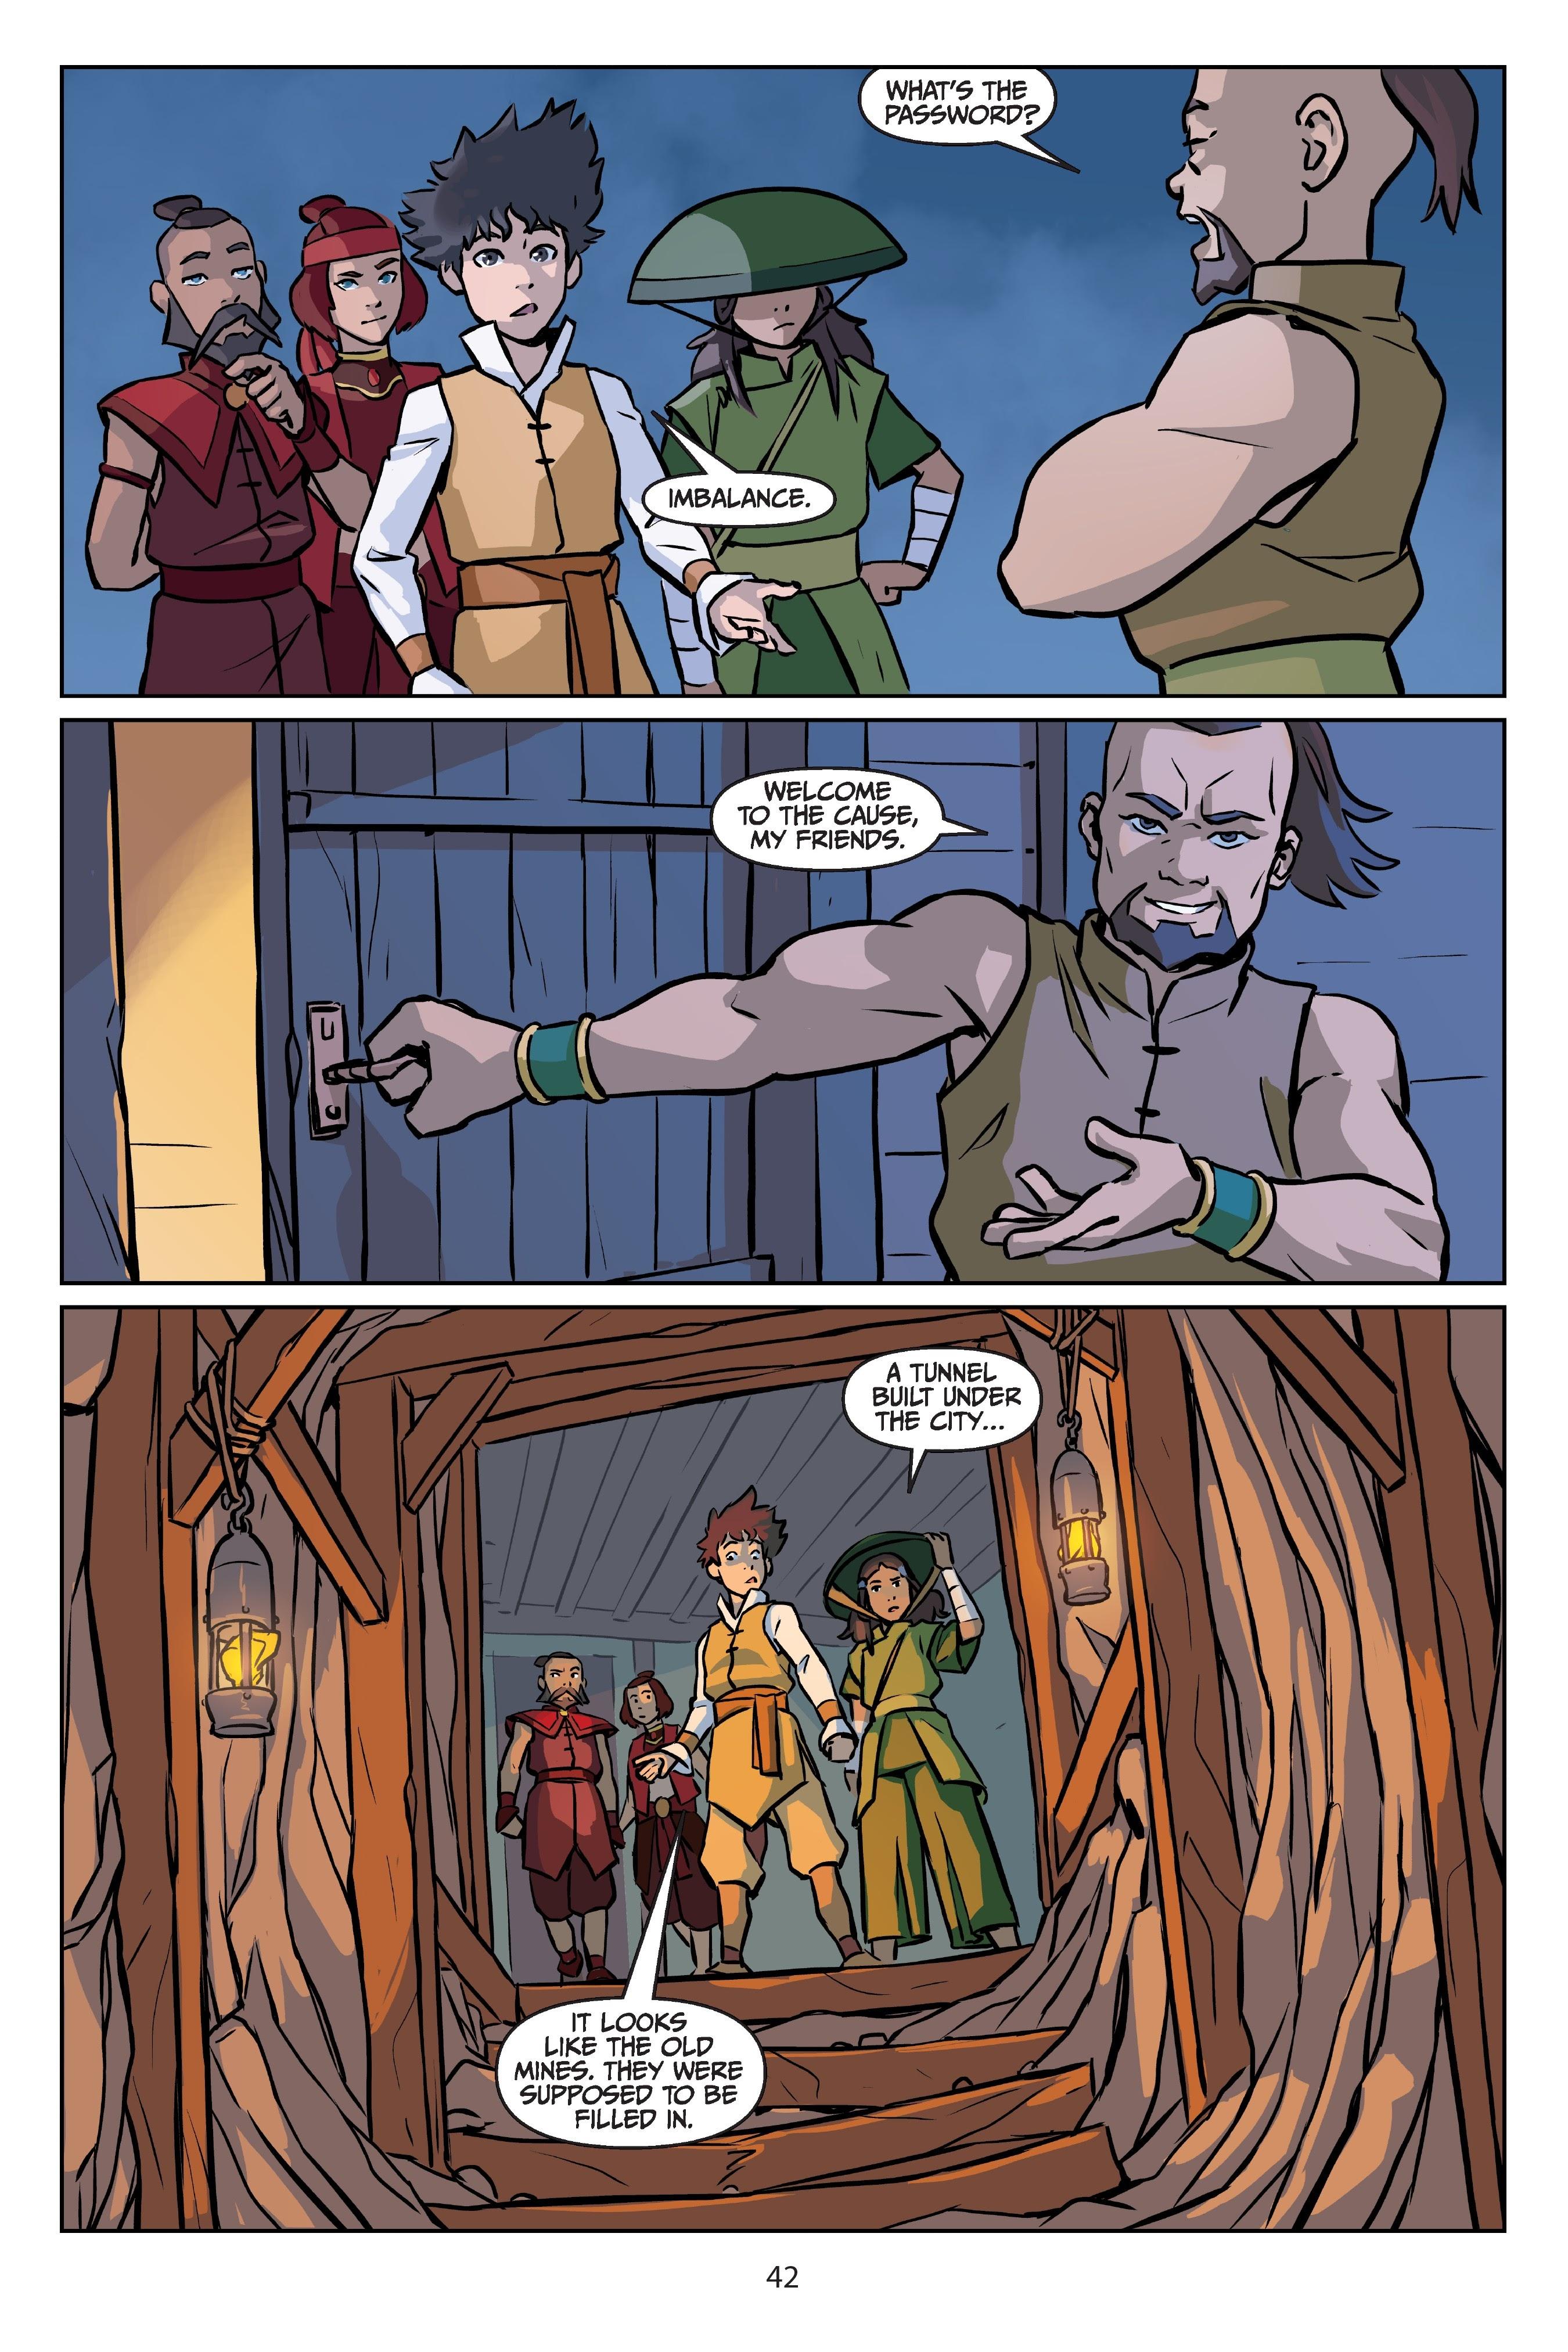 Nickelodeon Avatar: The Last Airbender - Imbalance TPB_2 Page 42